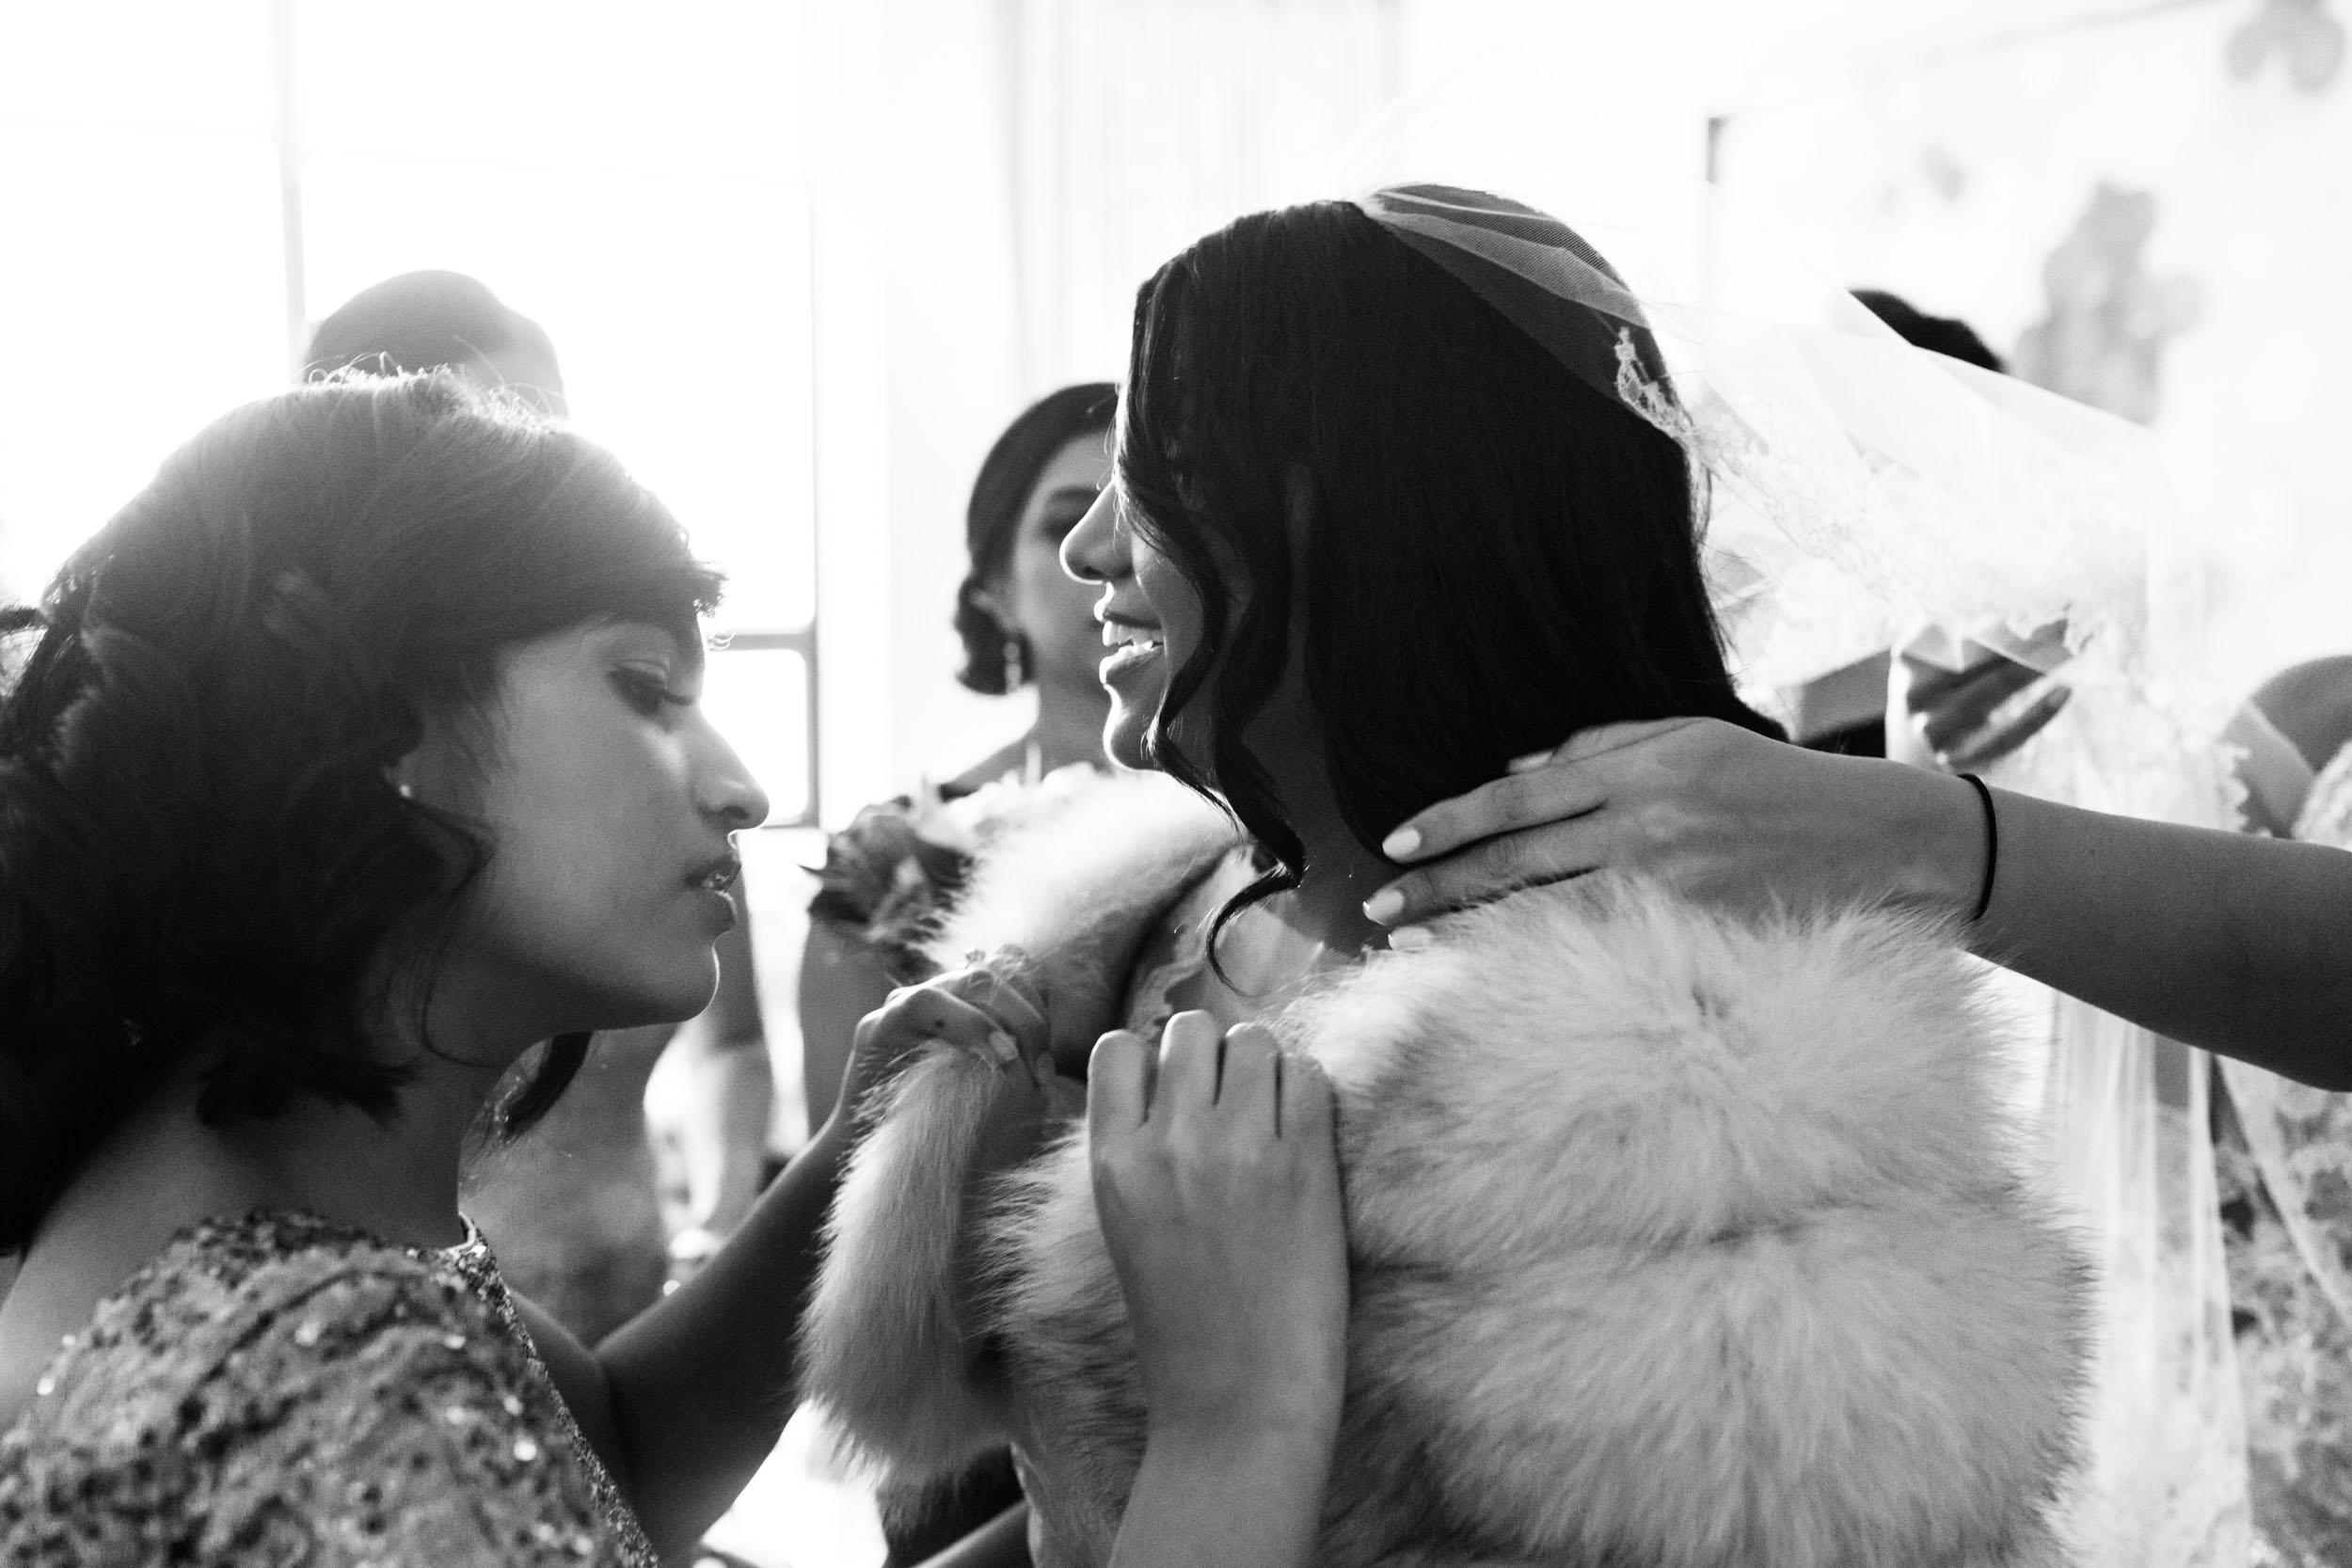 Bridesmaids help bride get ready for wedding at Ritz Carlton Chicago